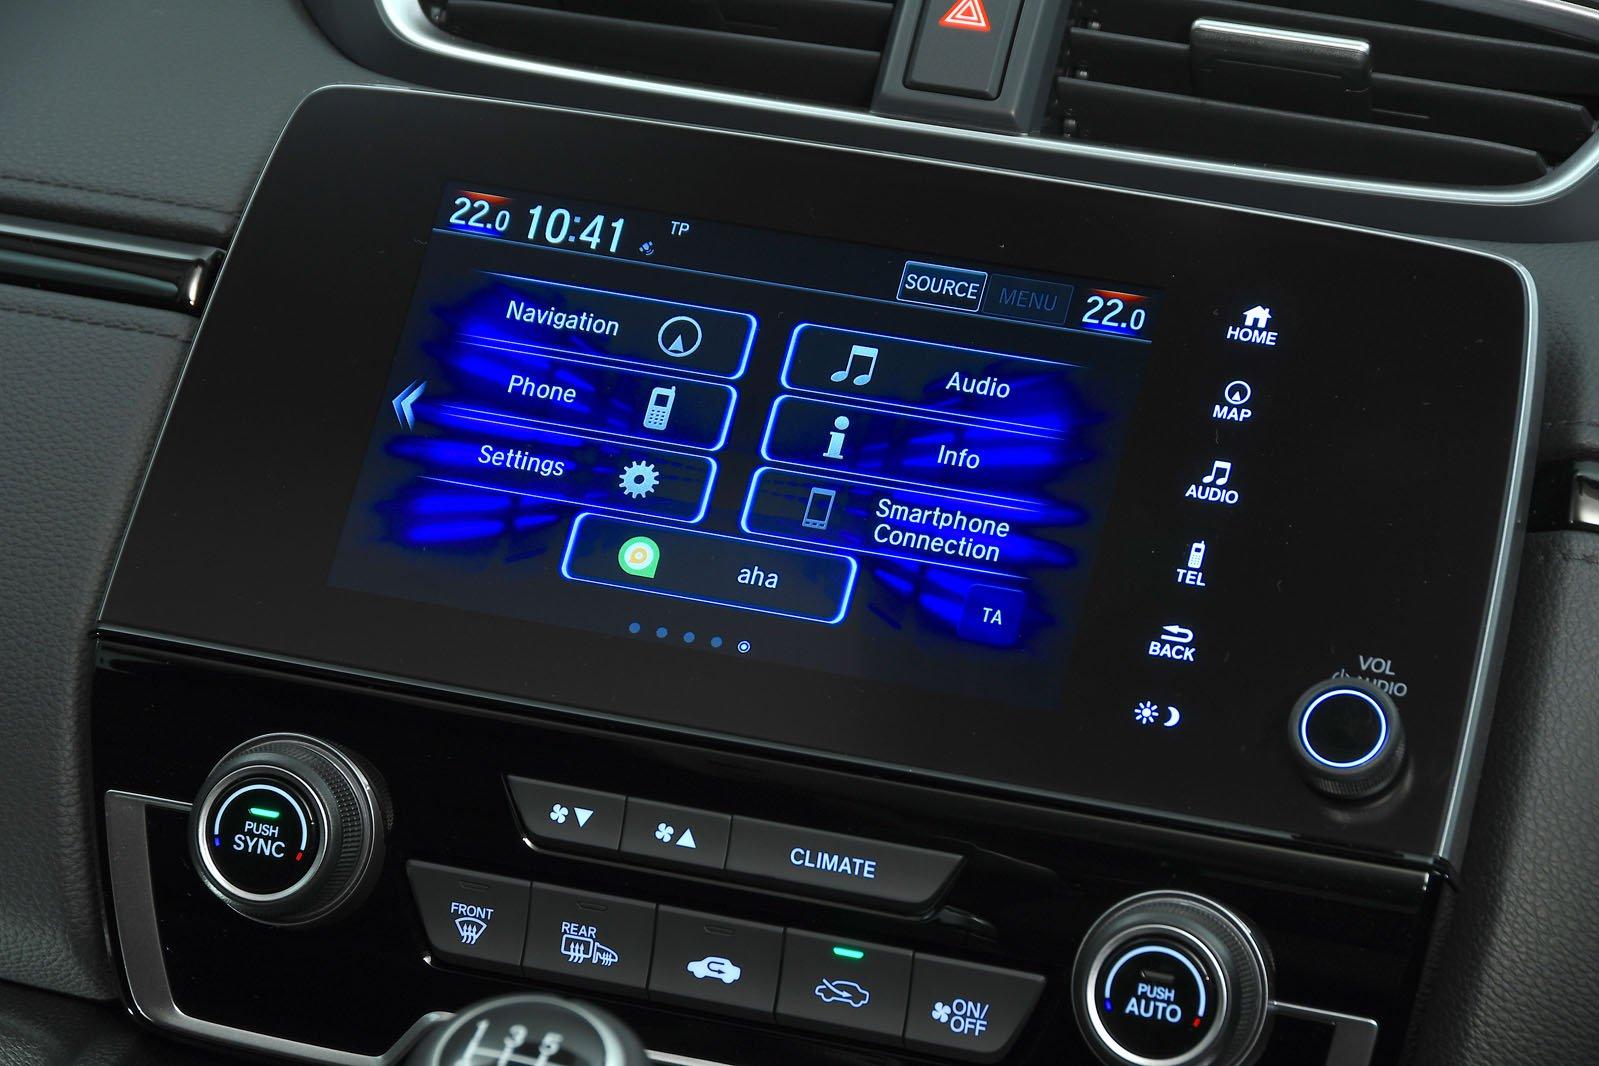 Honda CR-V infotainment